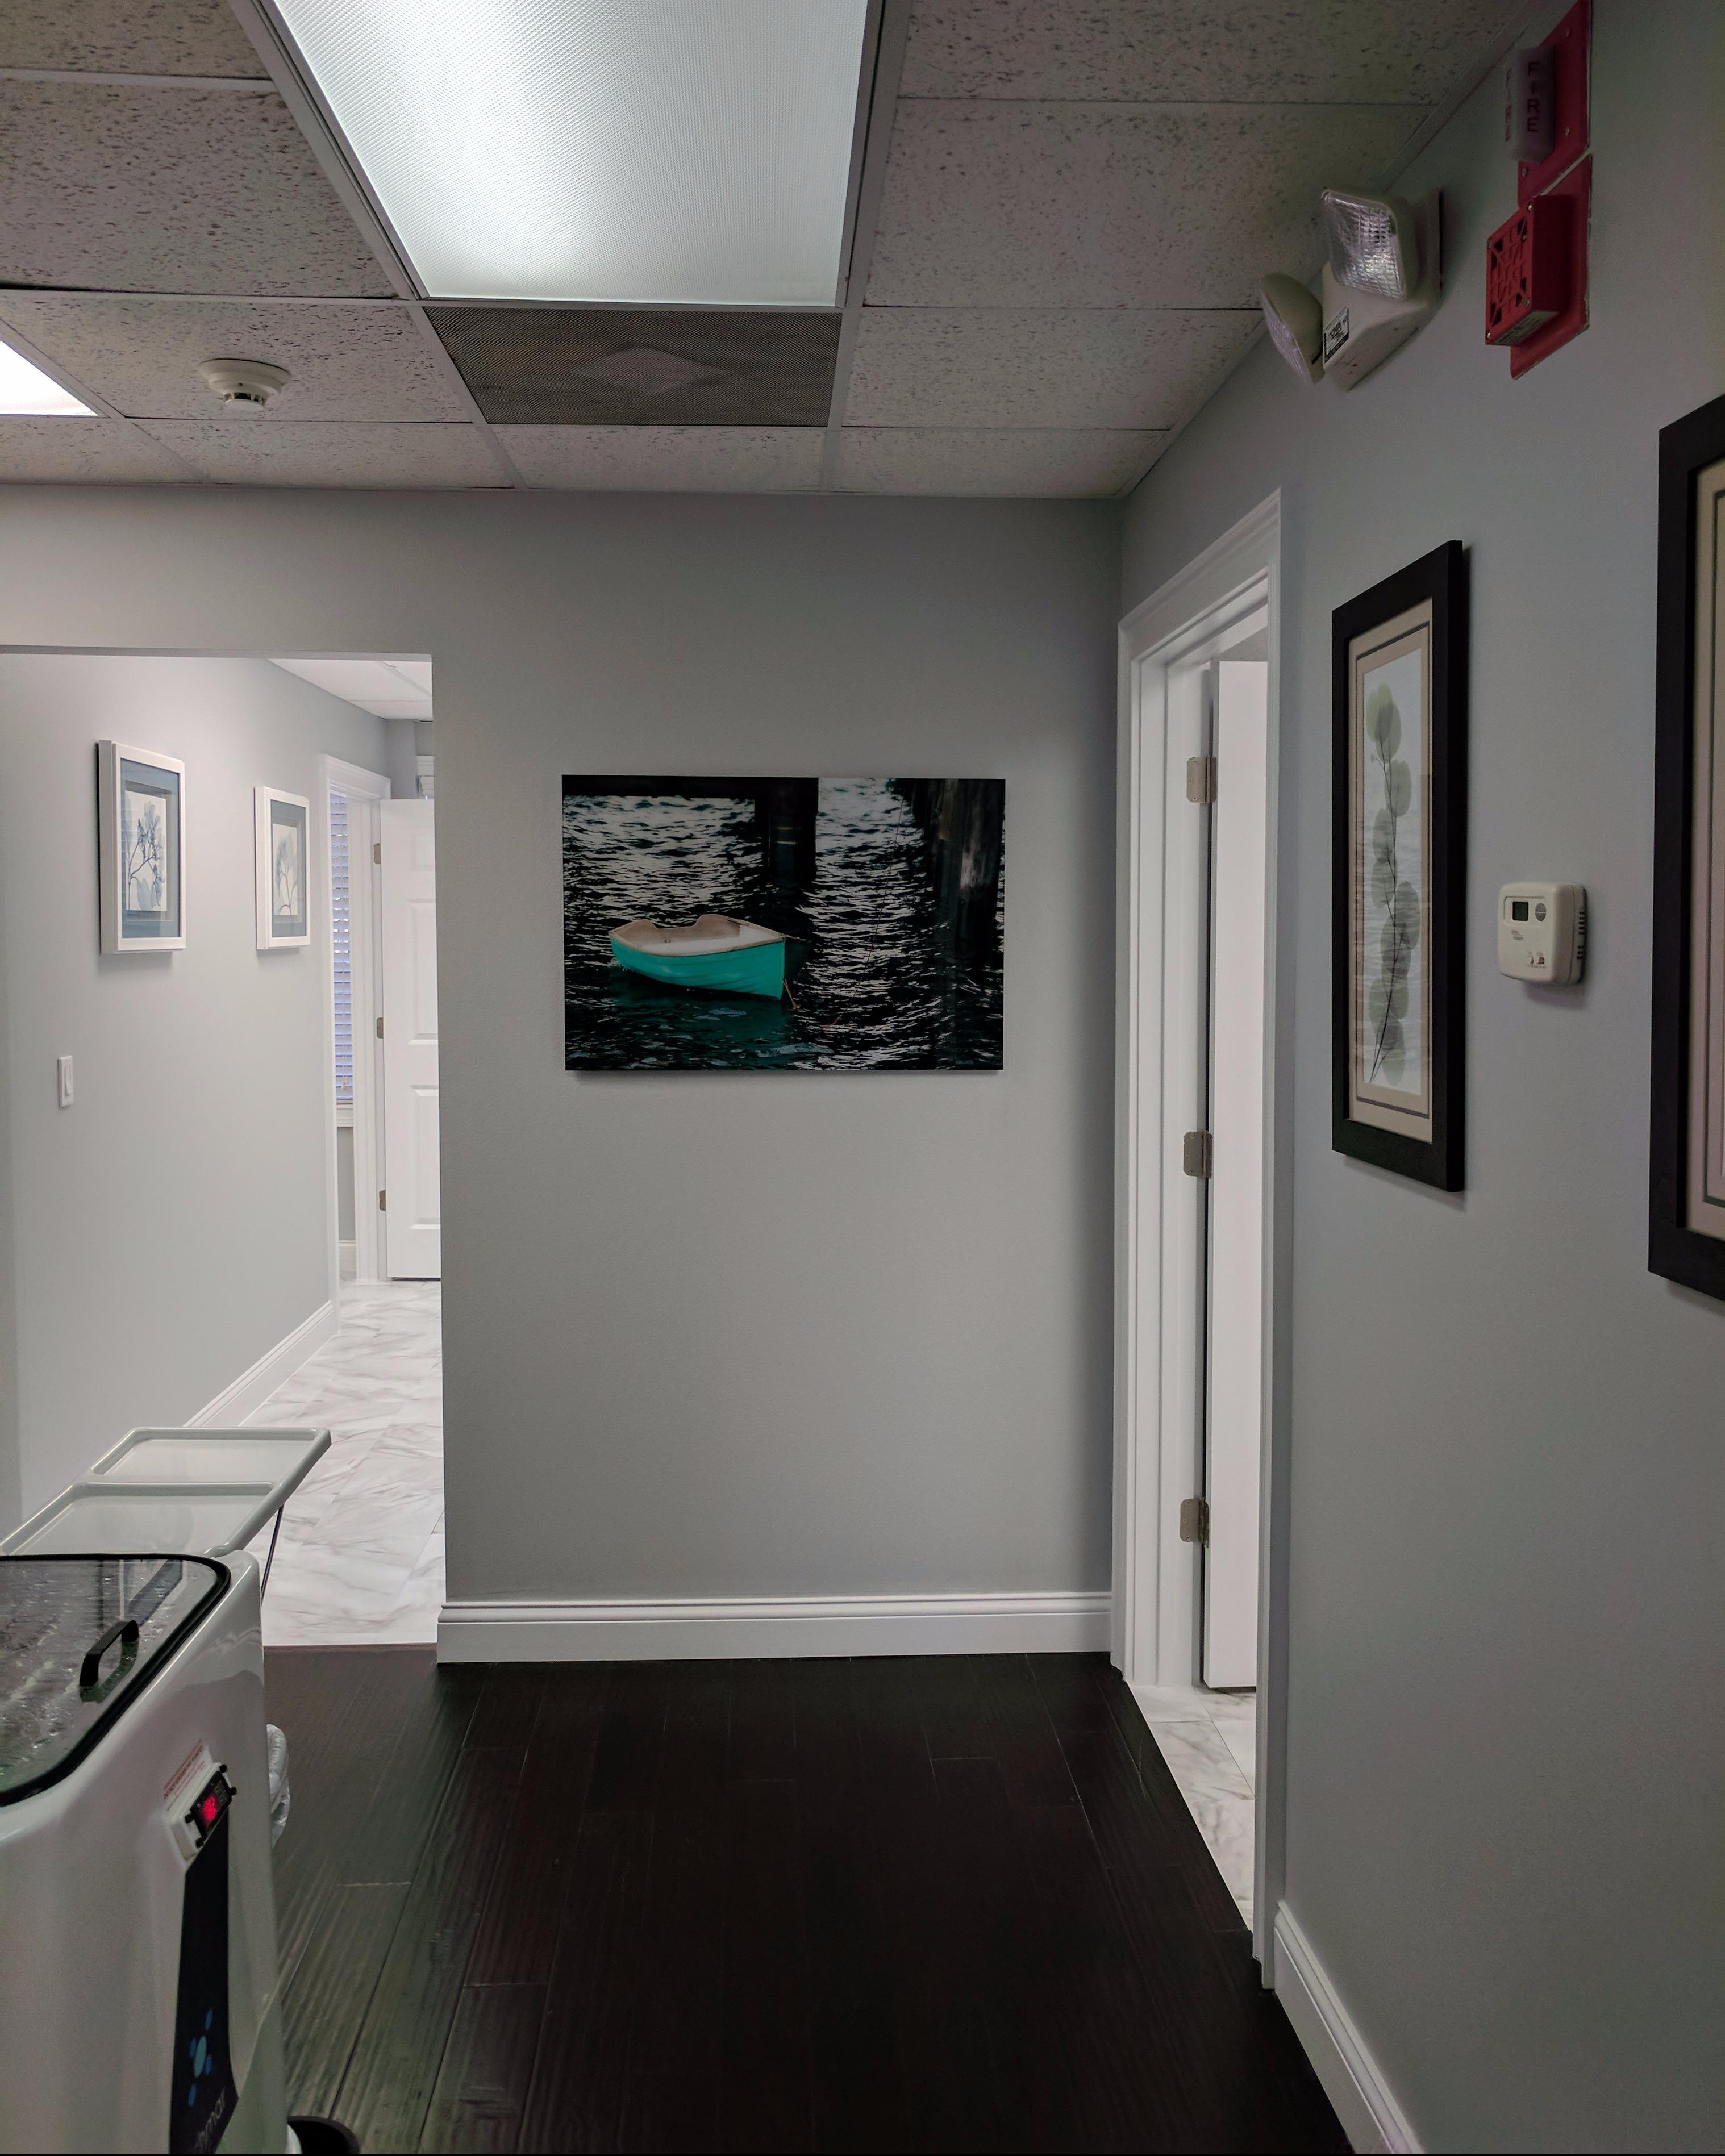 United Joint & Spine Center image 6